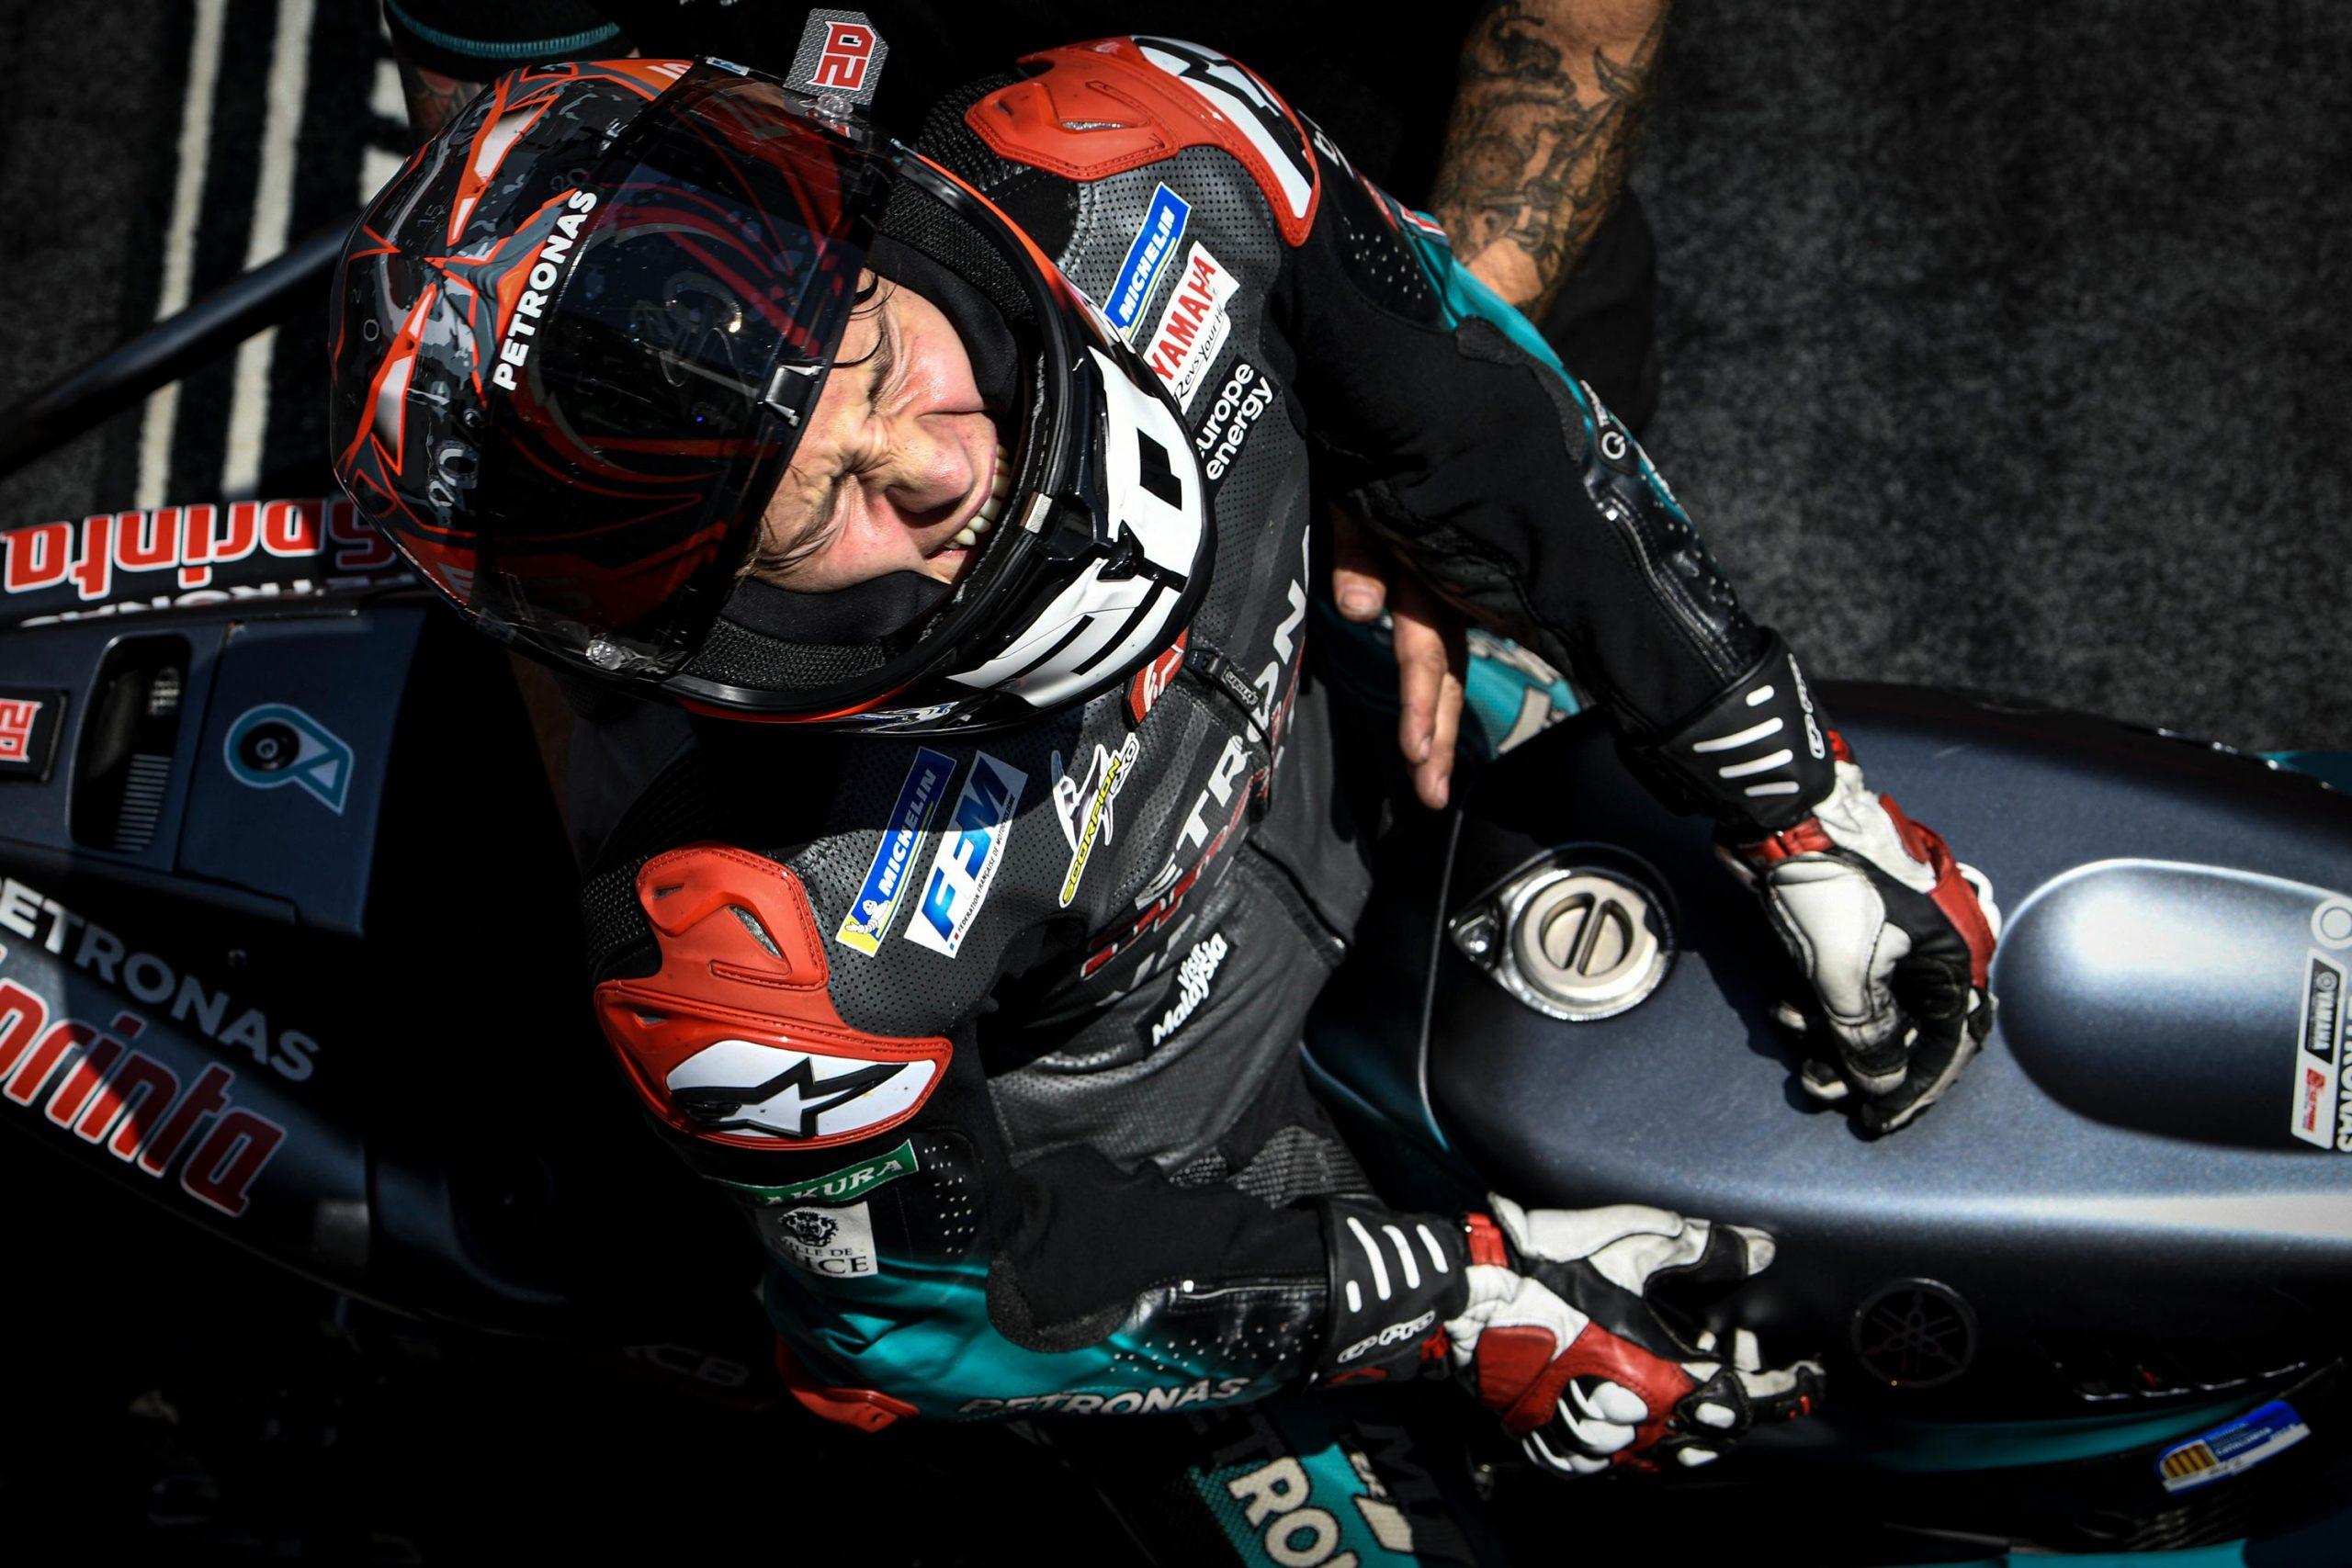 Fabio Quartararo S Paul Ricard Practice Bike And Whether The Punishment Will Fit The Crime Asphalt Rubber